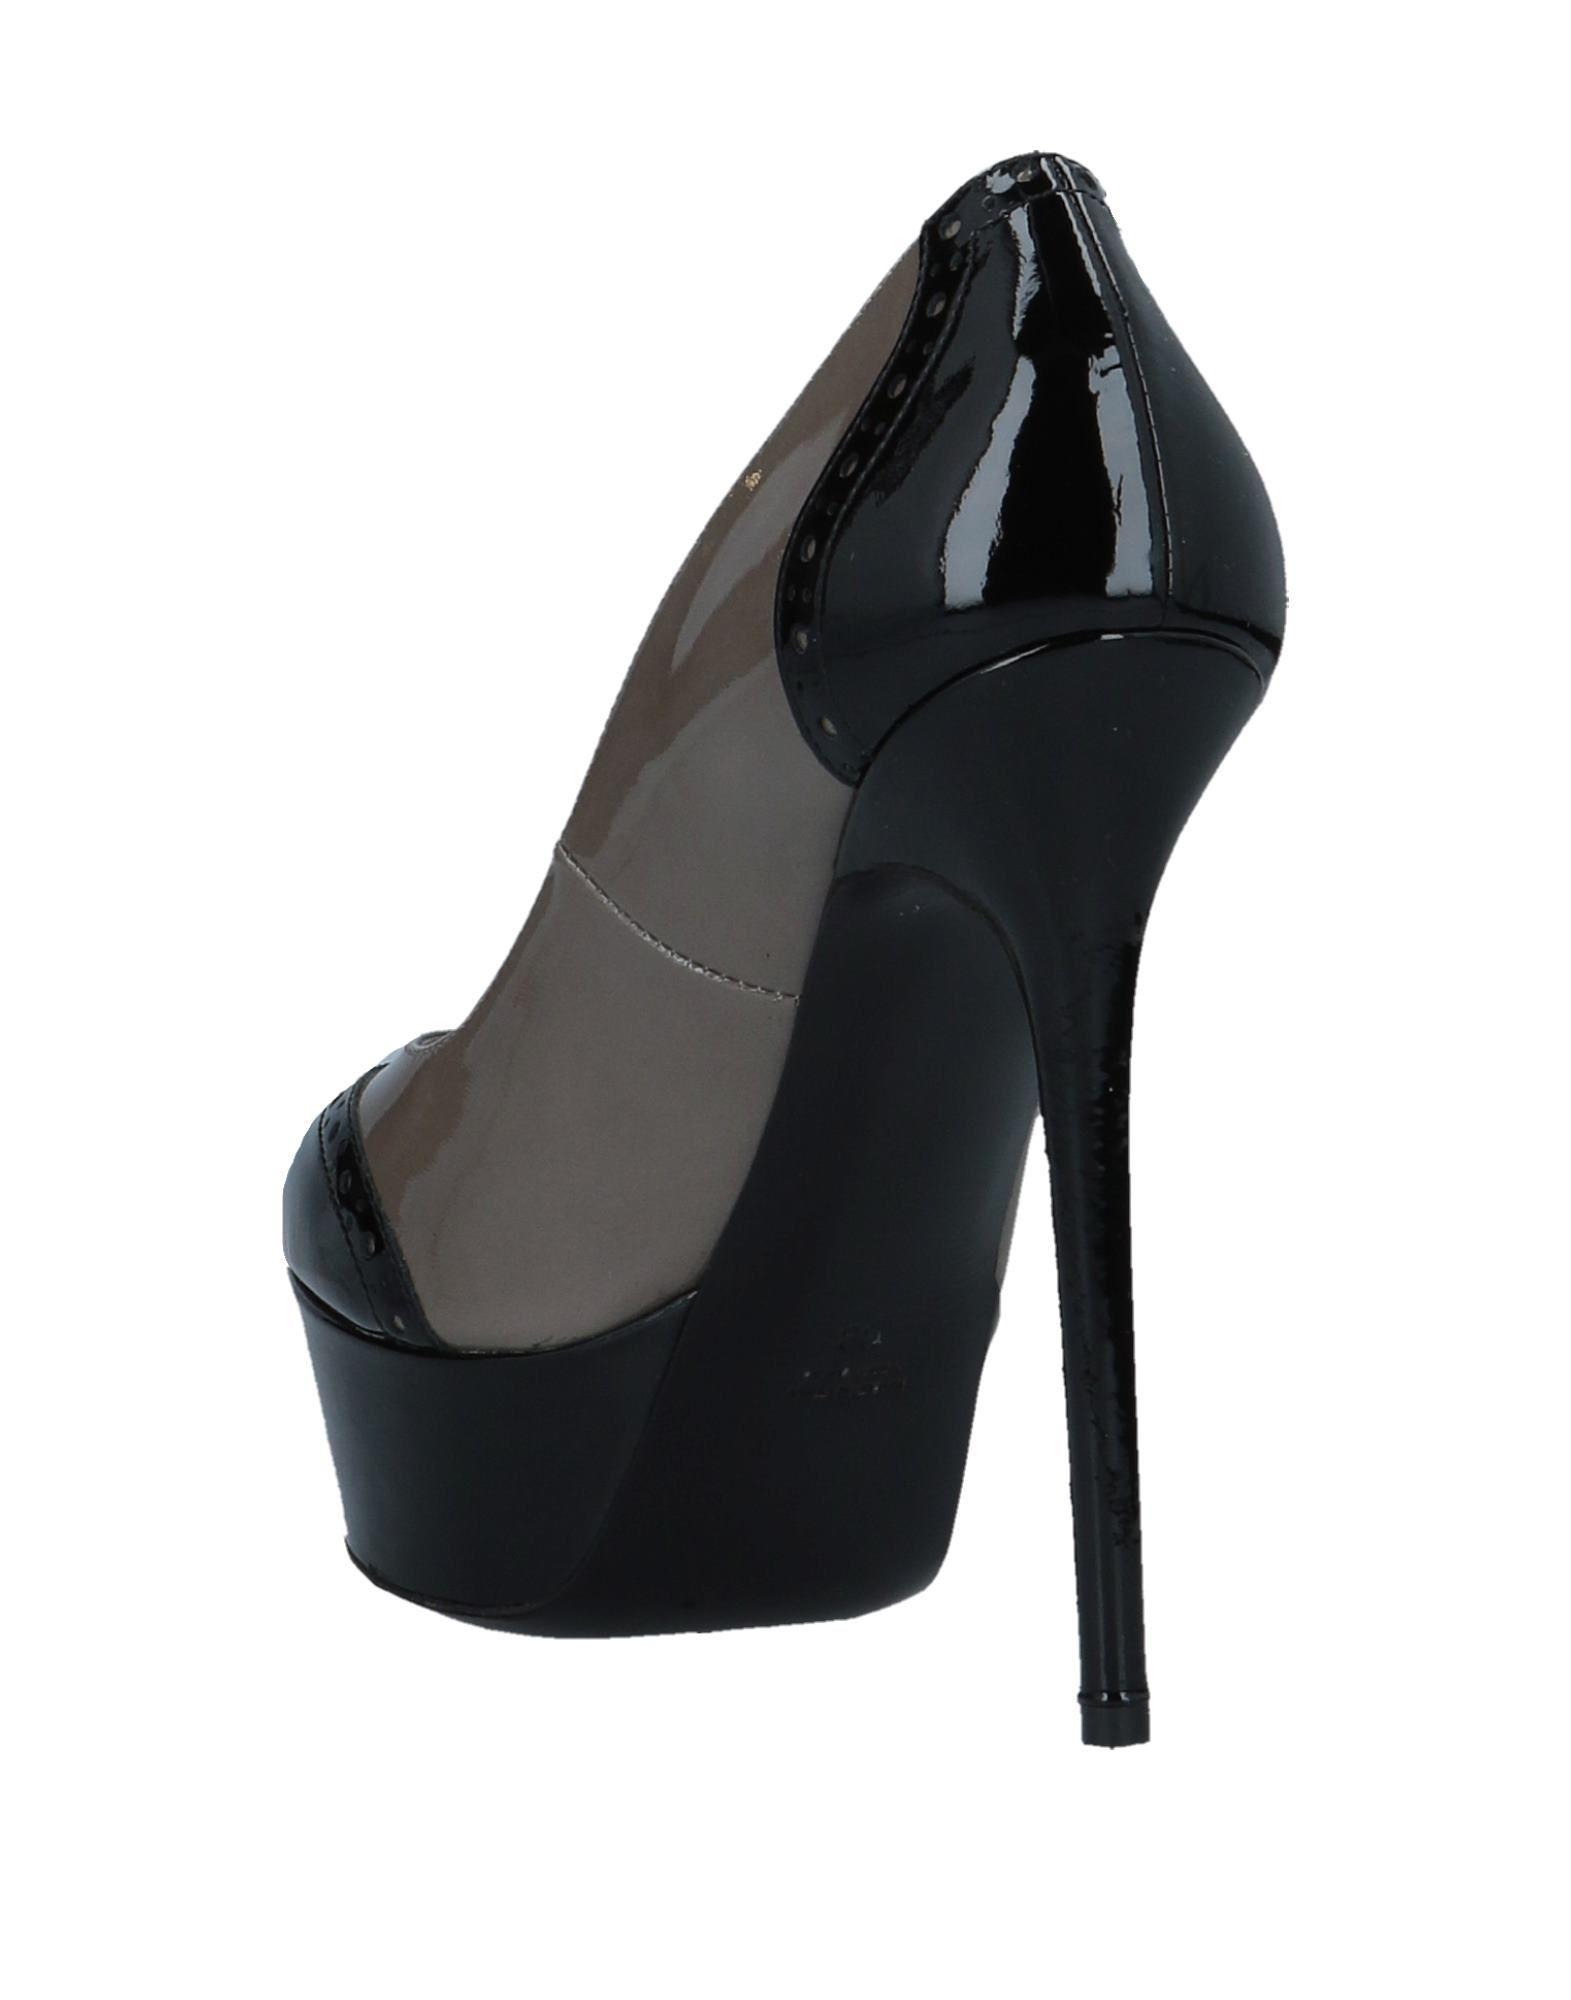 E clat Pumps Damen Schuhe 11544728RI Gute Qualität beliebte Schuhe Damen 9f1a5c